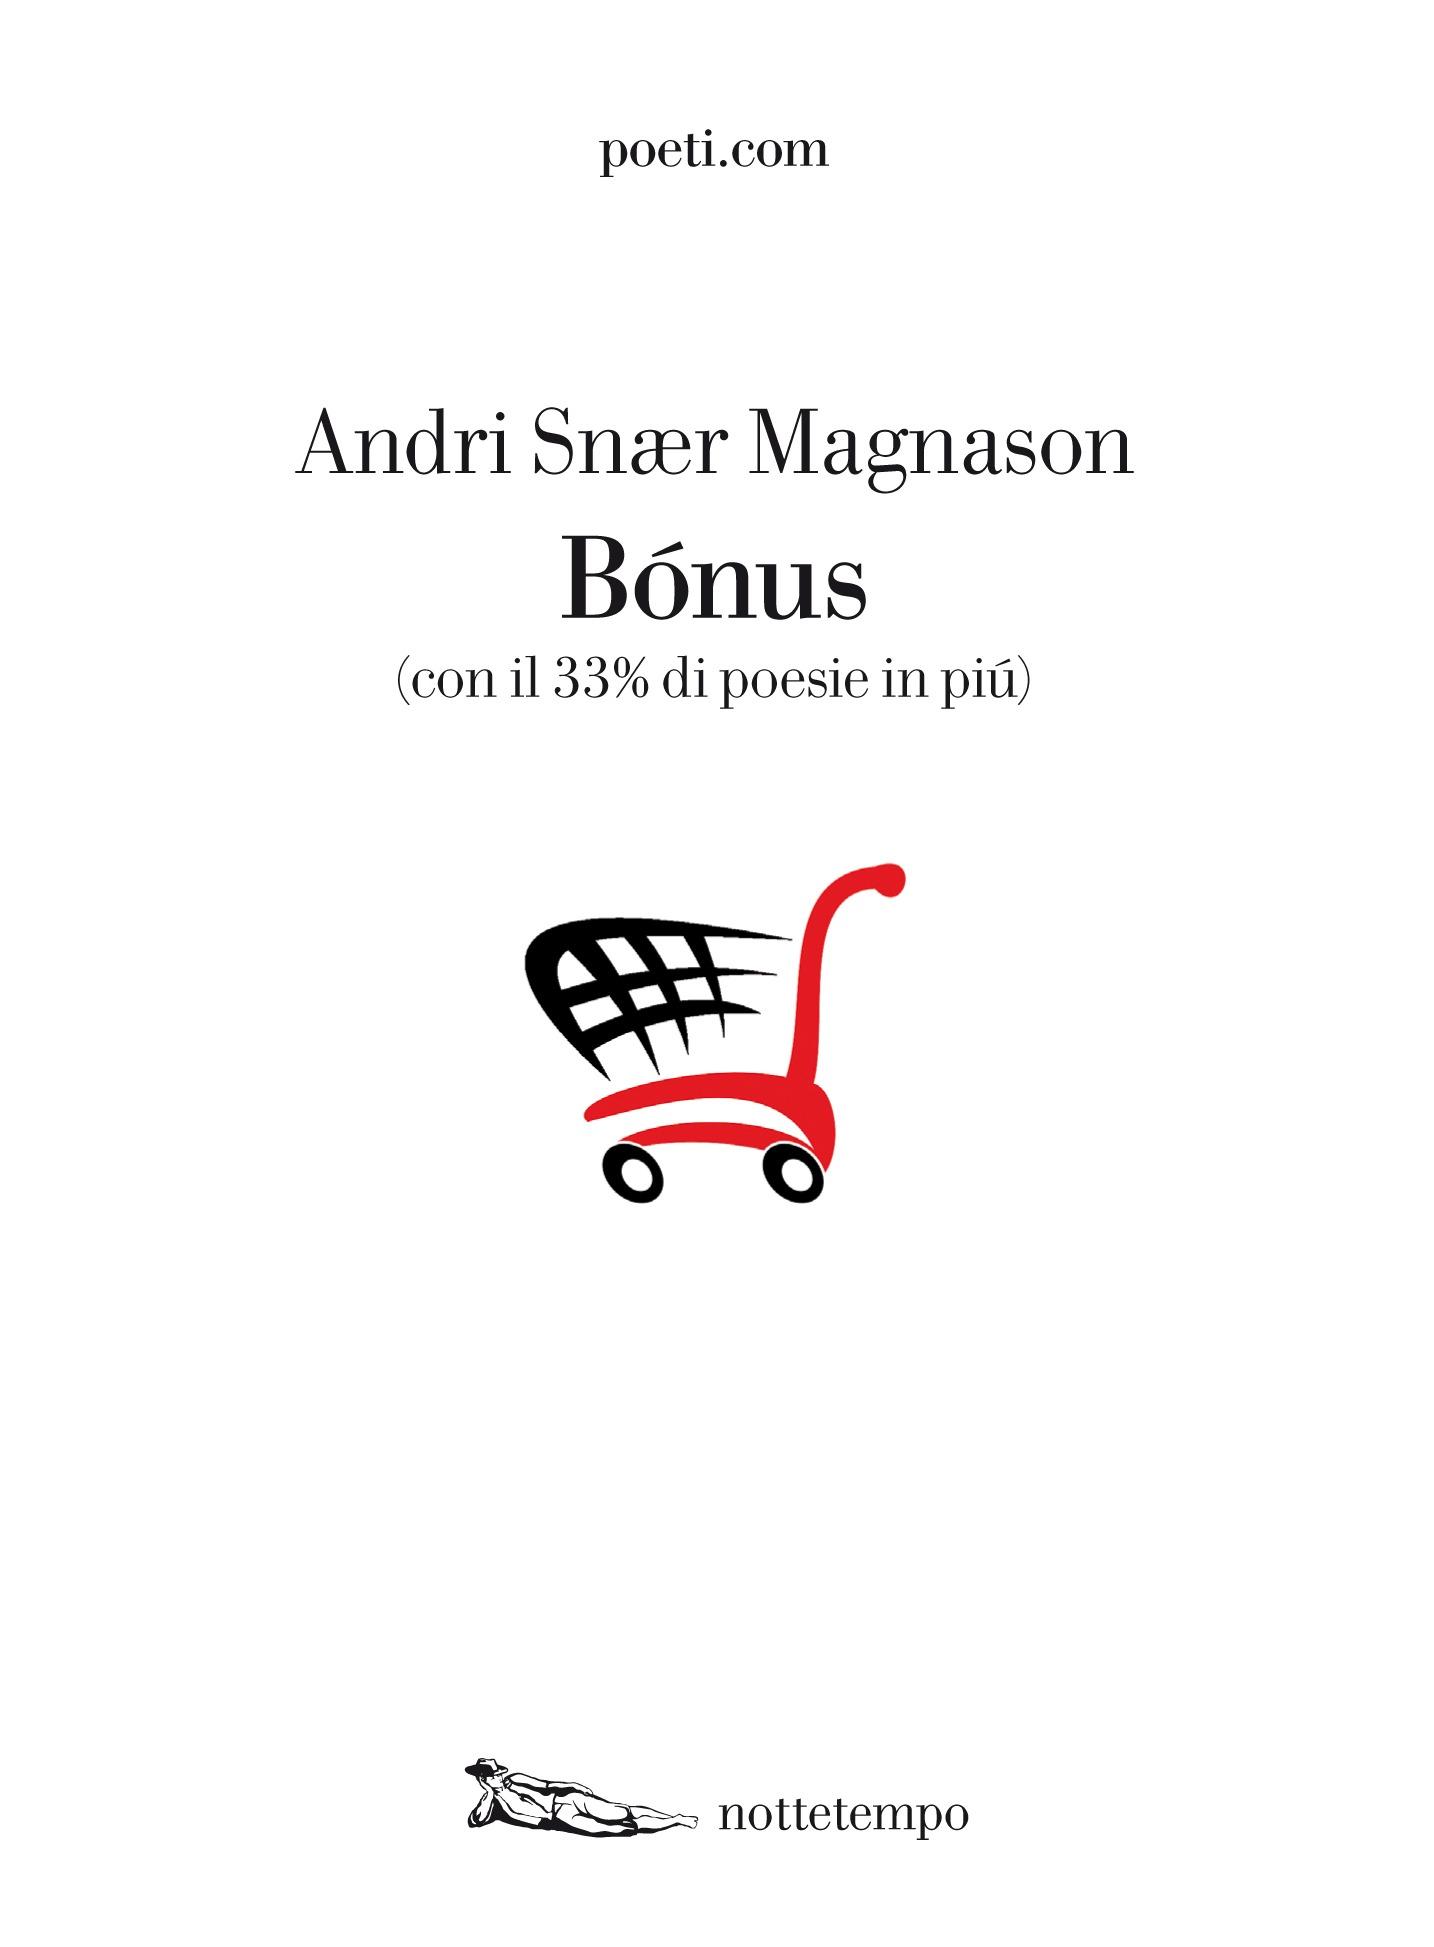 Bonus – Andri Snaer Magnason